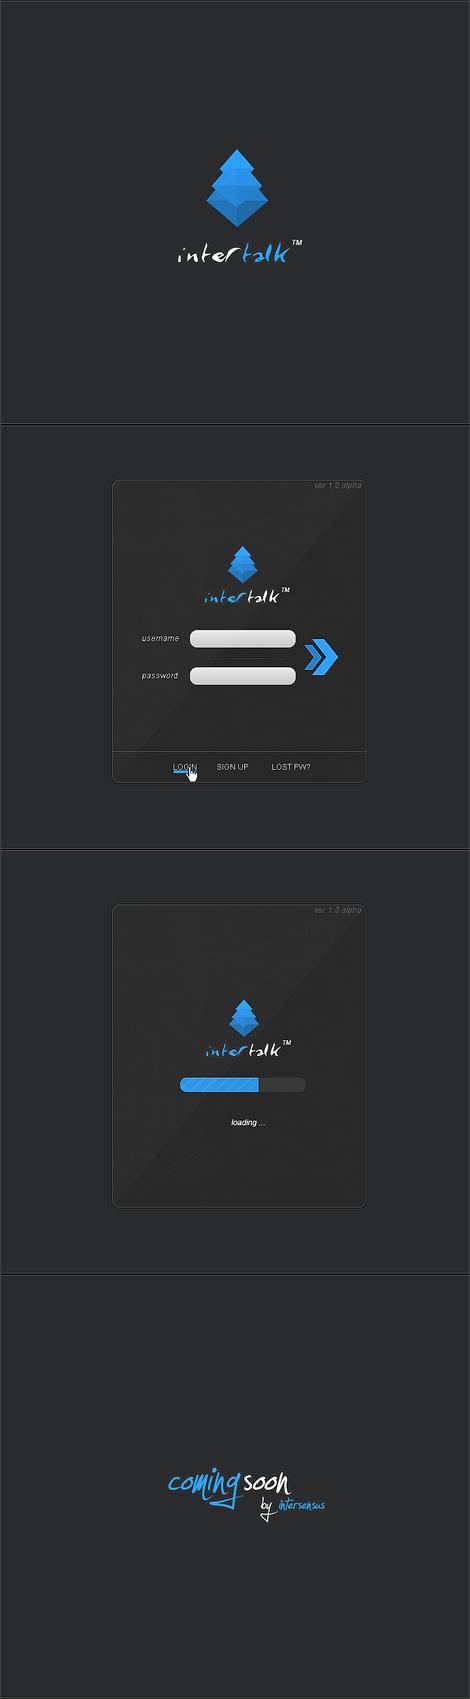 Intertalk Messenger by lpzdesign